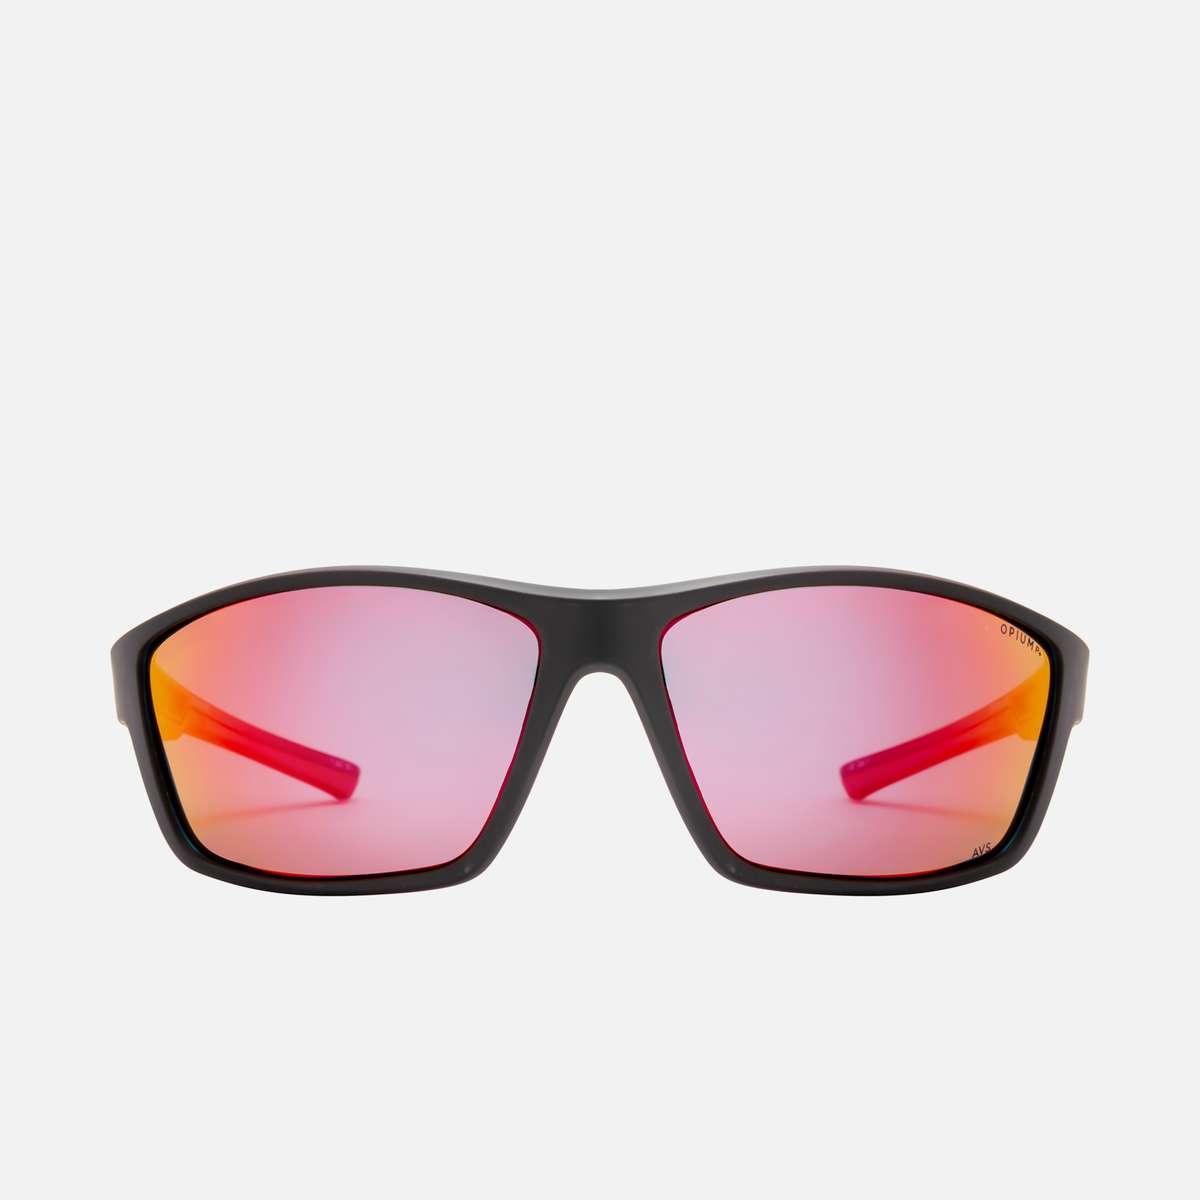 4.OPIUM Men Sporty Polarized Sunglasses OP-1811-C03